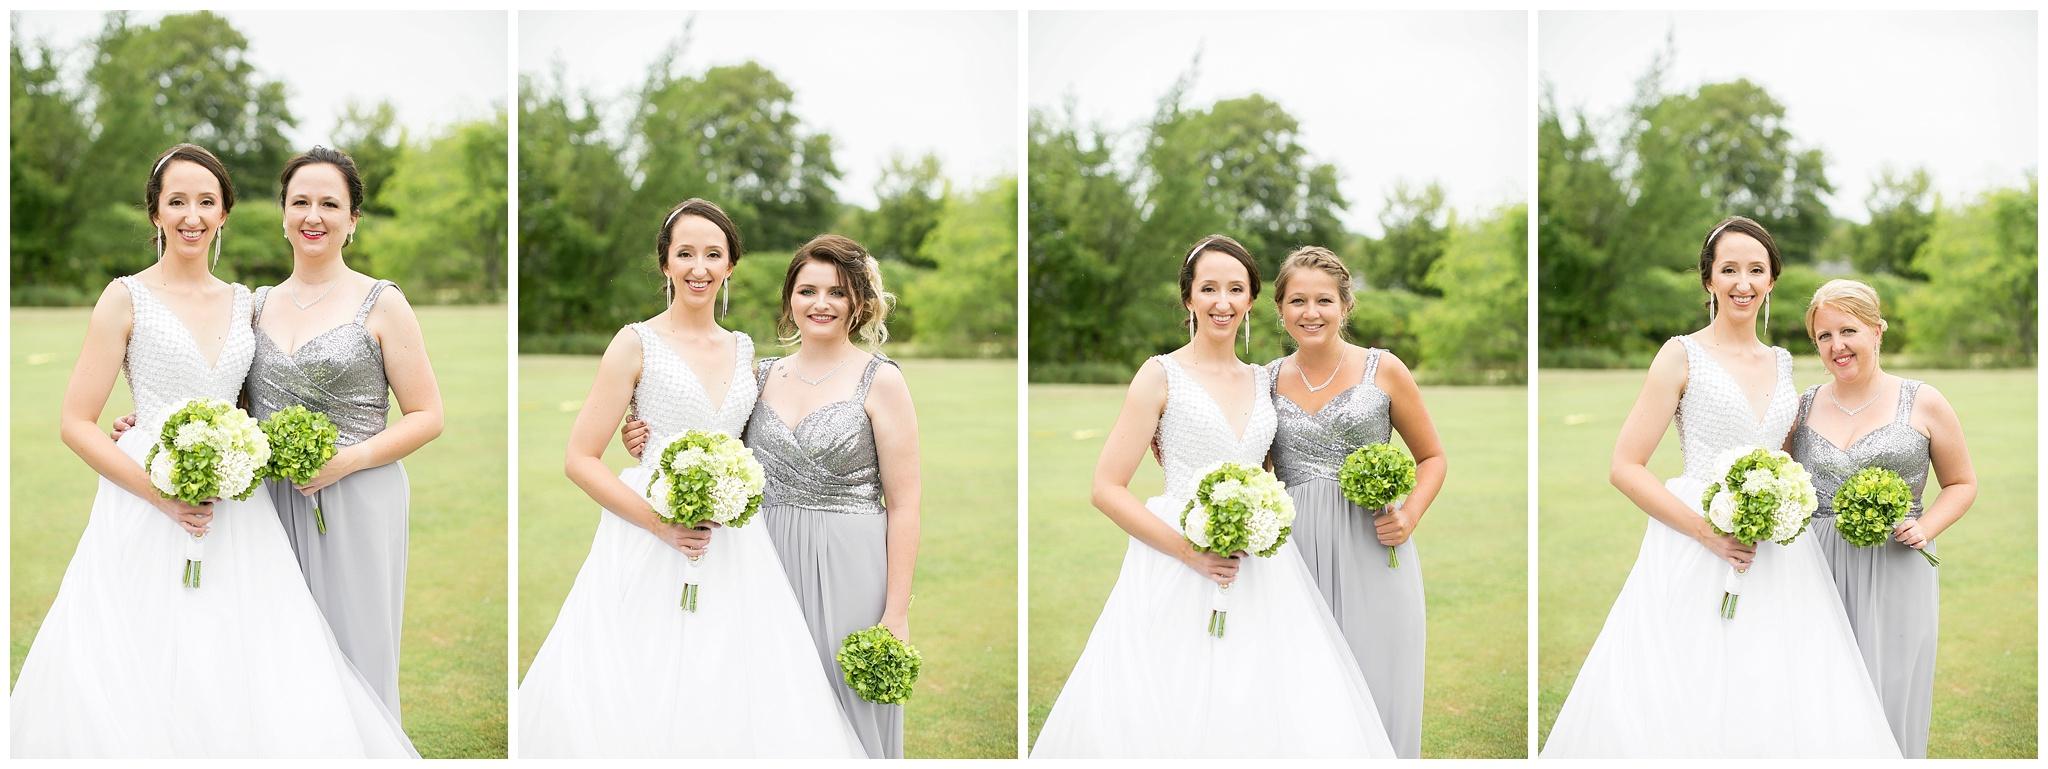 bridgewood_resort_wedding_neenah_wisconsin_0318.jpg